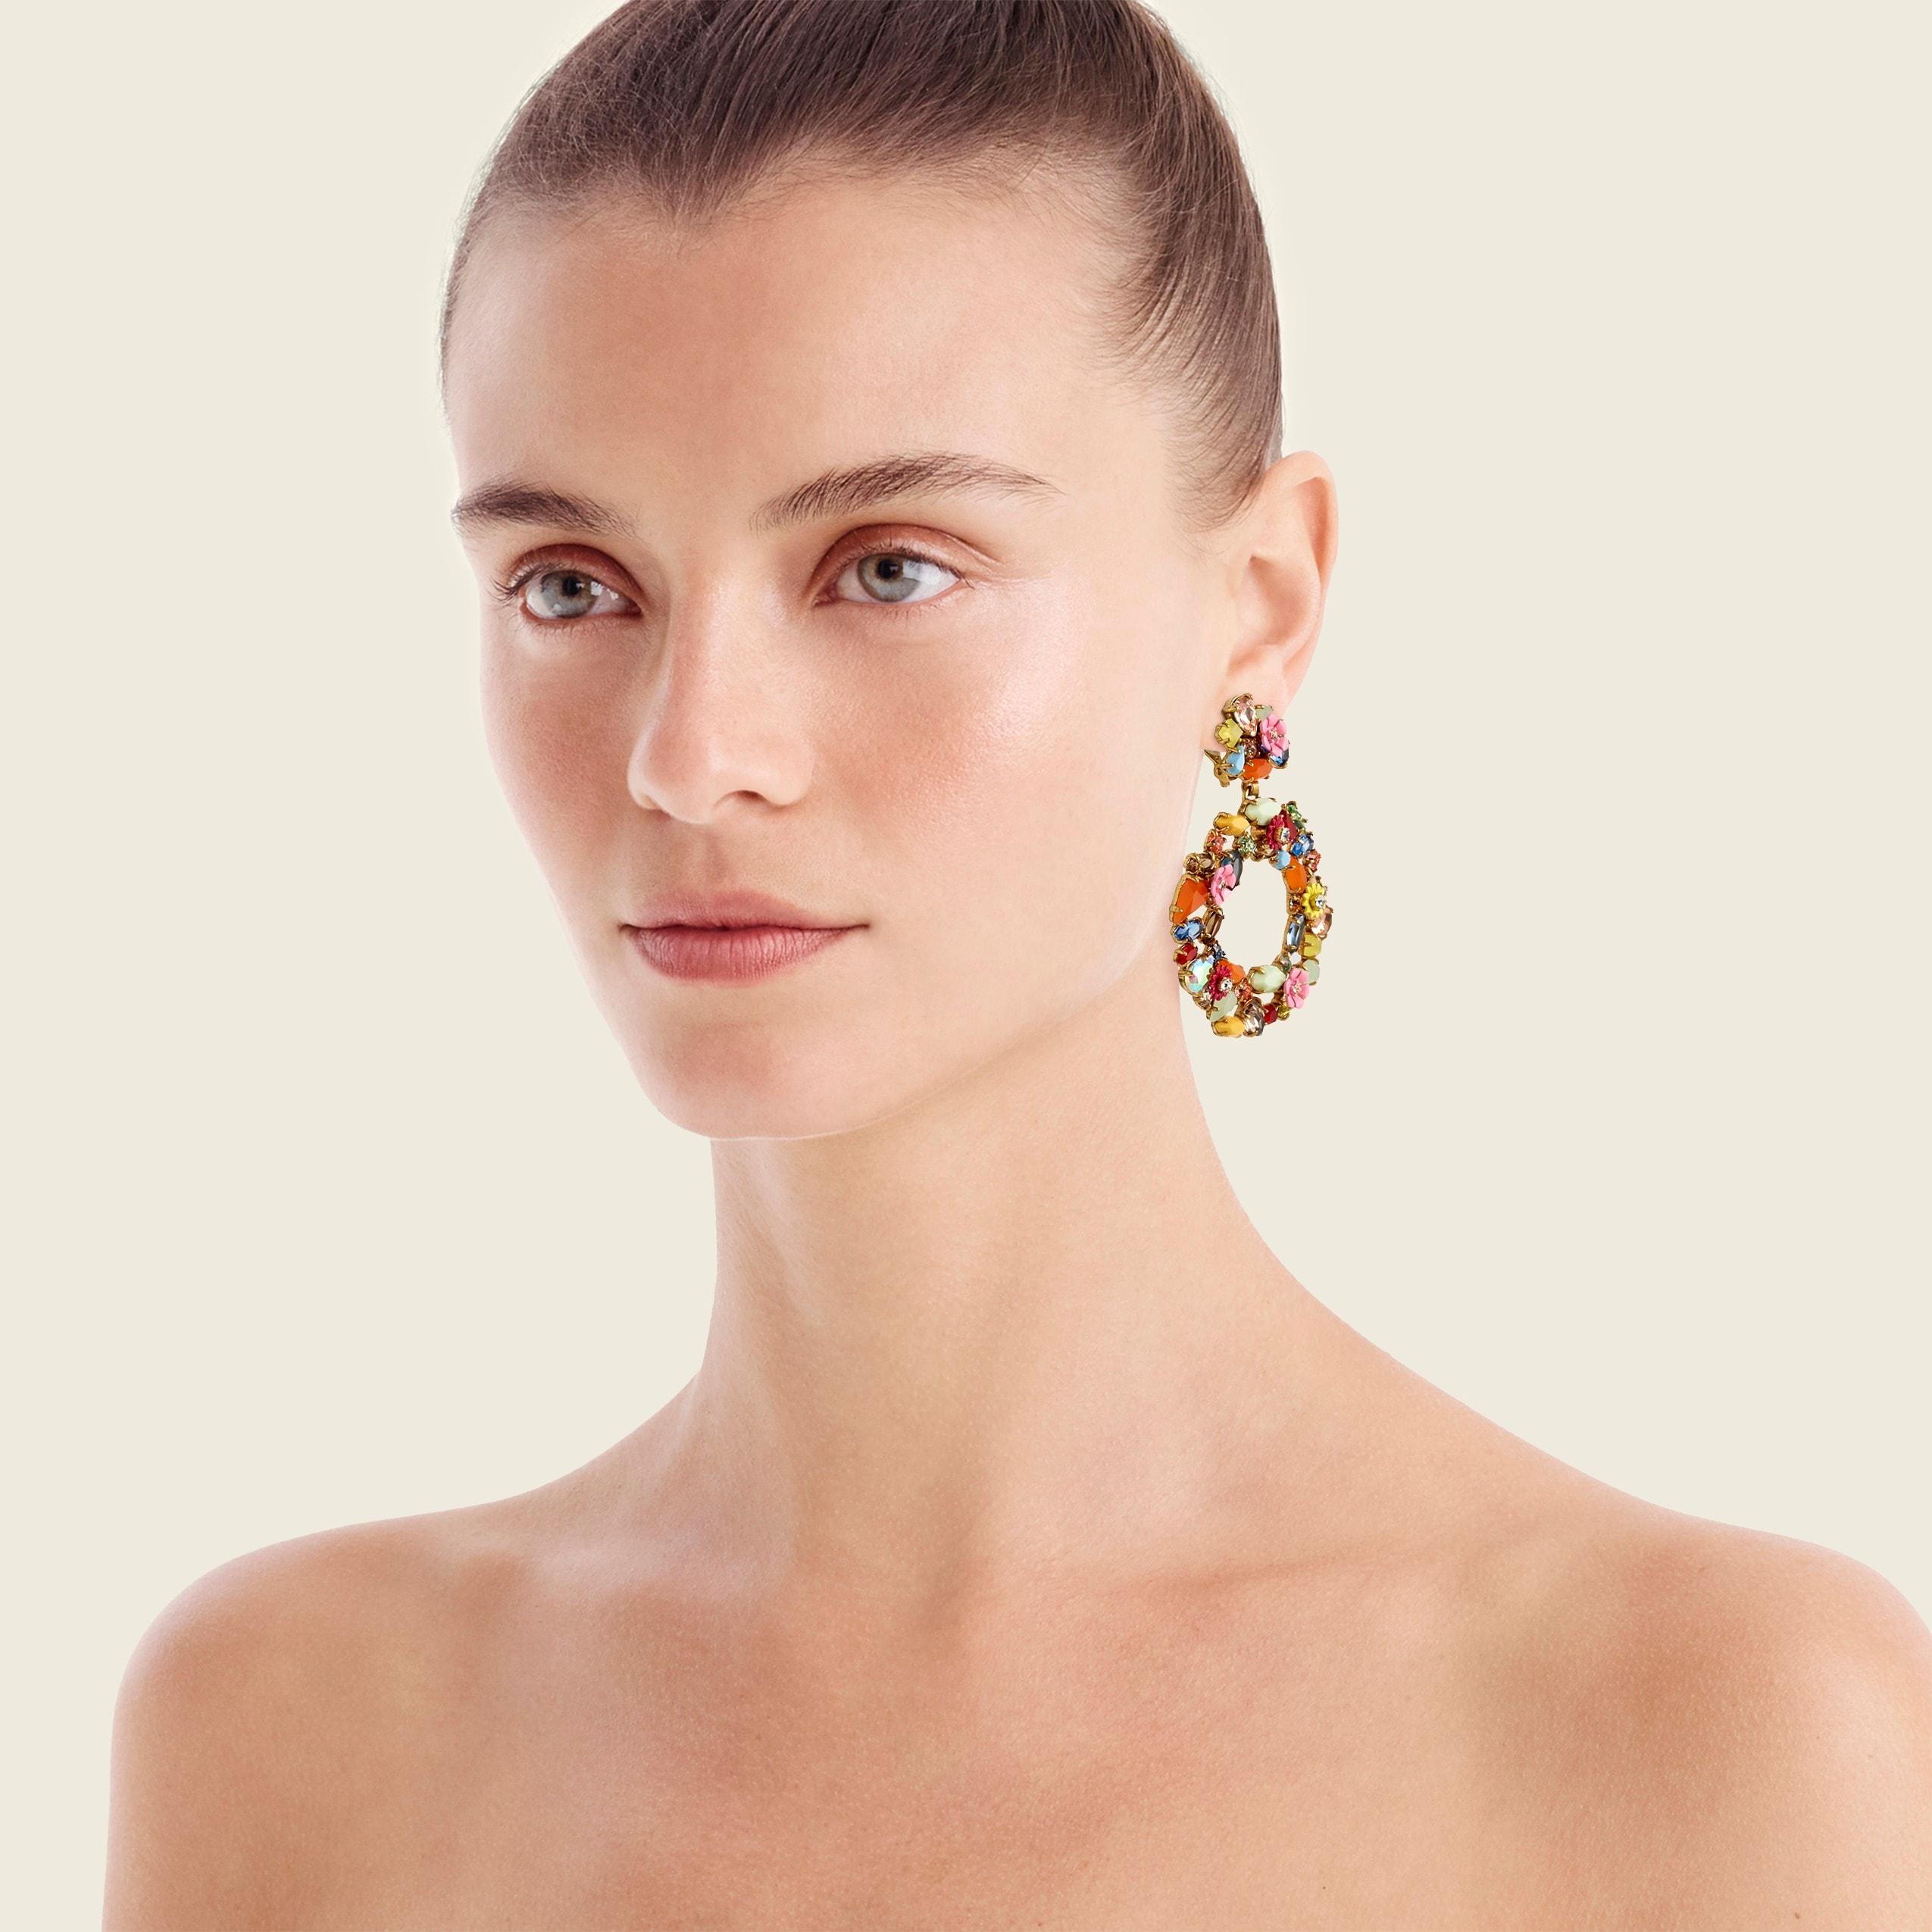 Image 1 for Colorful floral hoop earrings